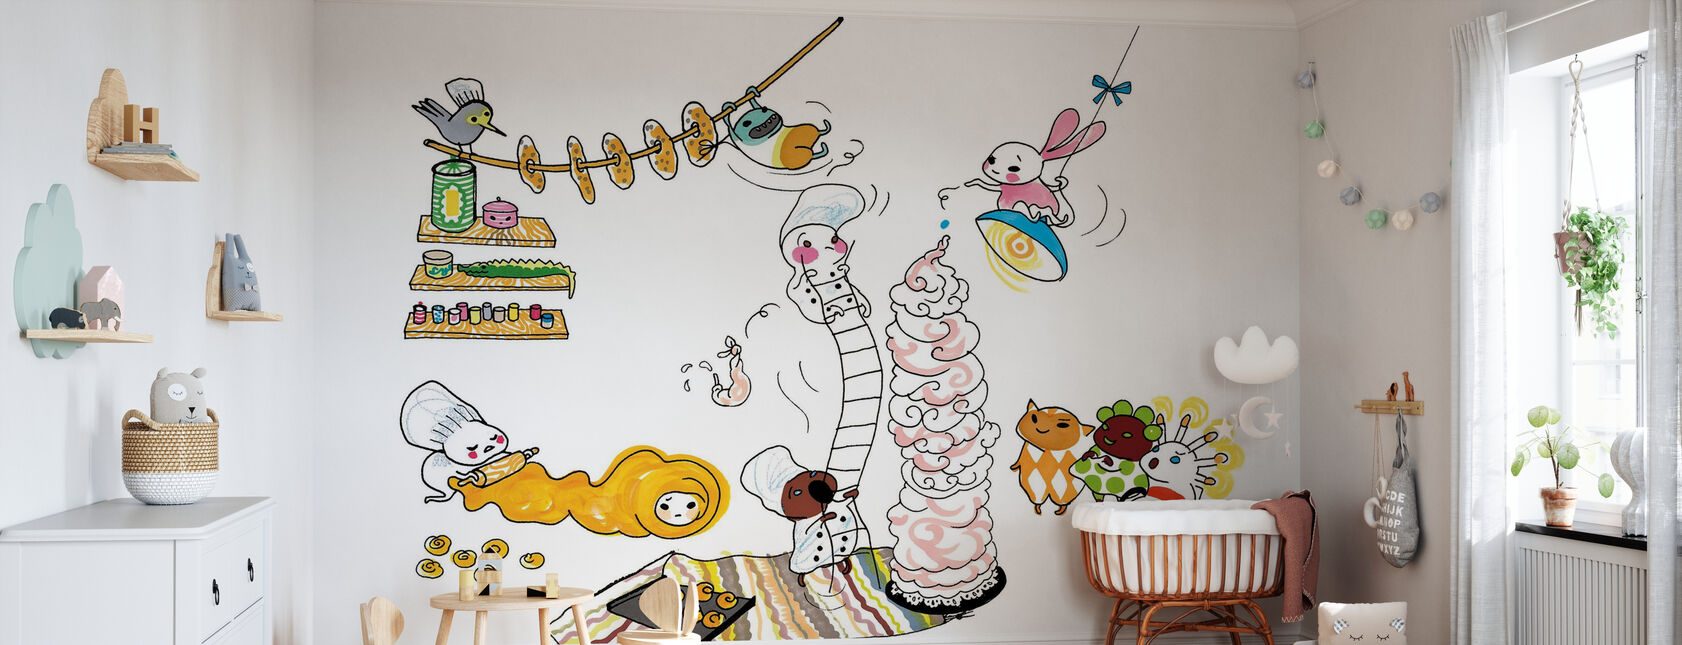 afterlife - Wallpaper - Nursery